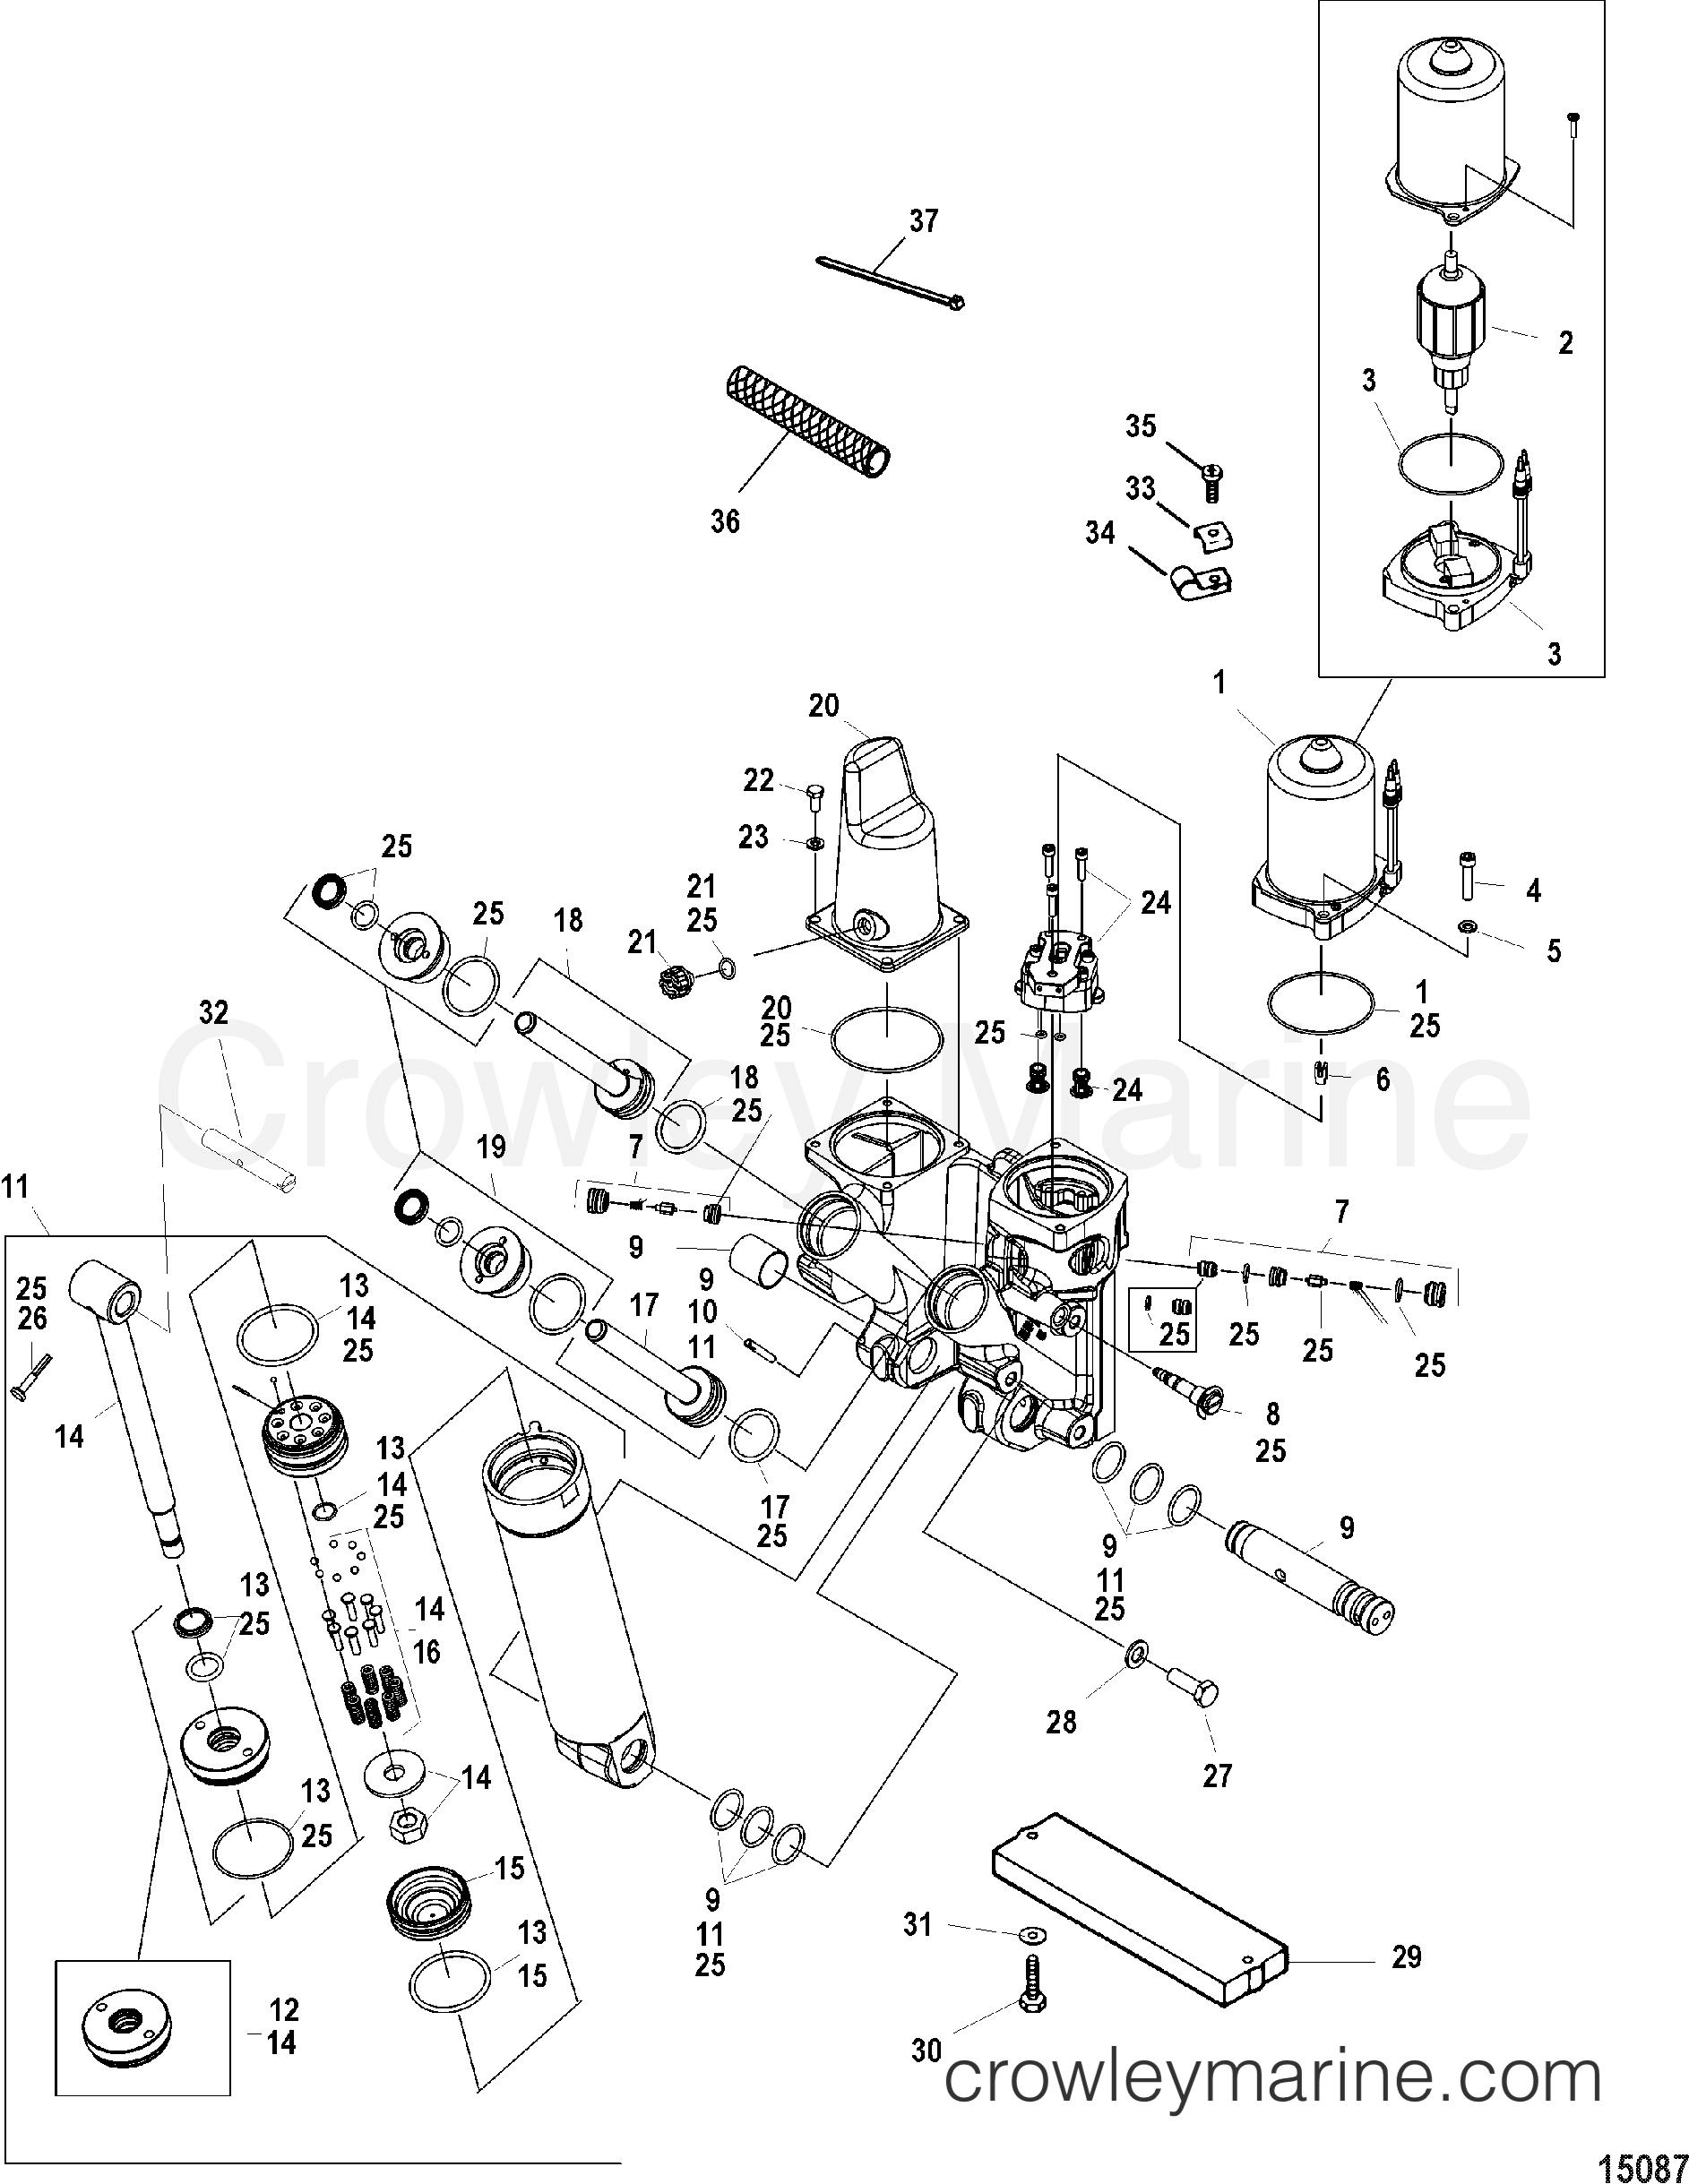 power trim kit 855998t1 855998a3 various years rigging parts rh crowleymarine com